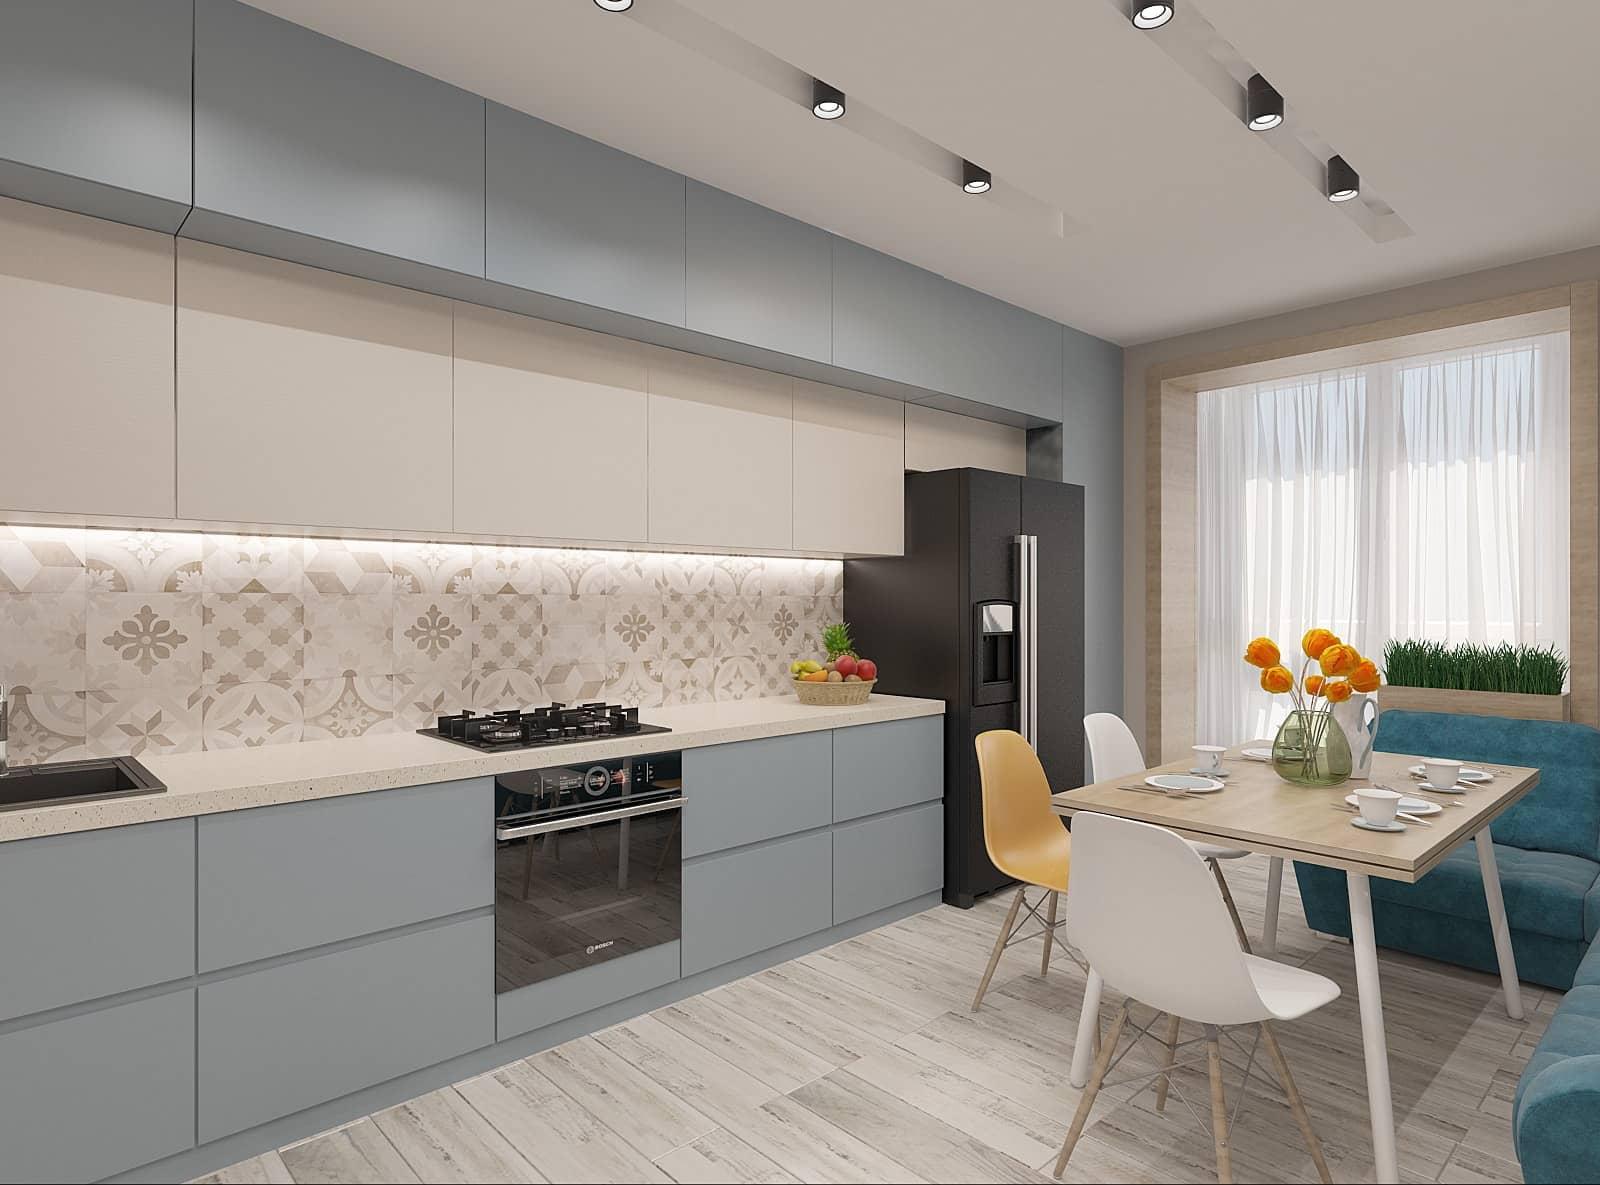 Дизайн кухні: фото 2.2